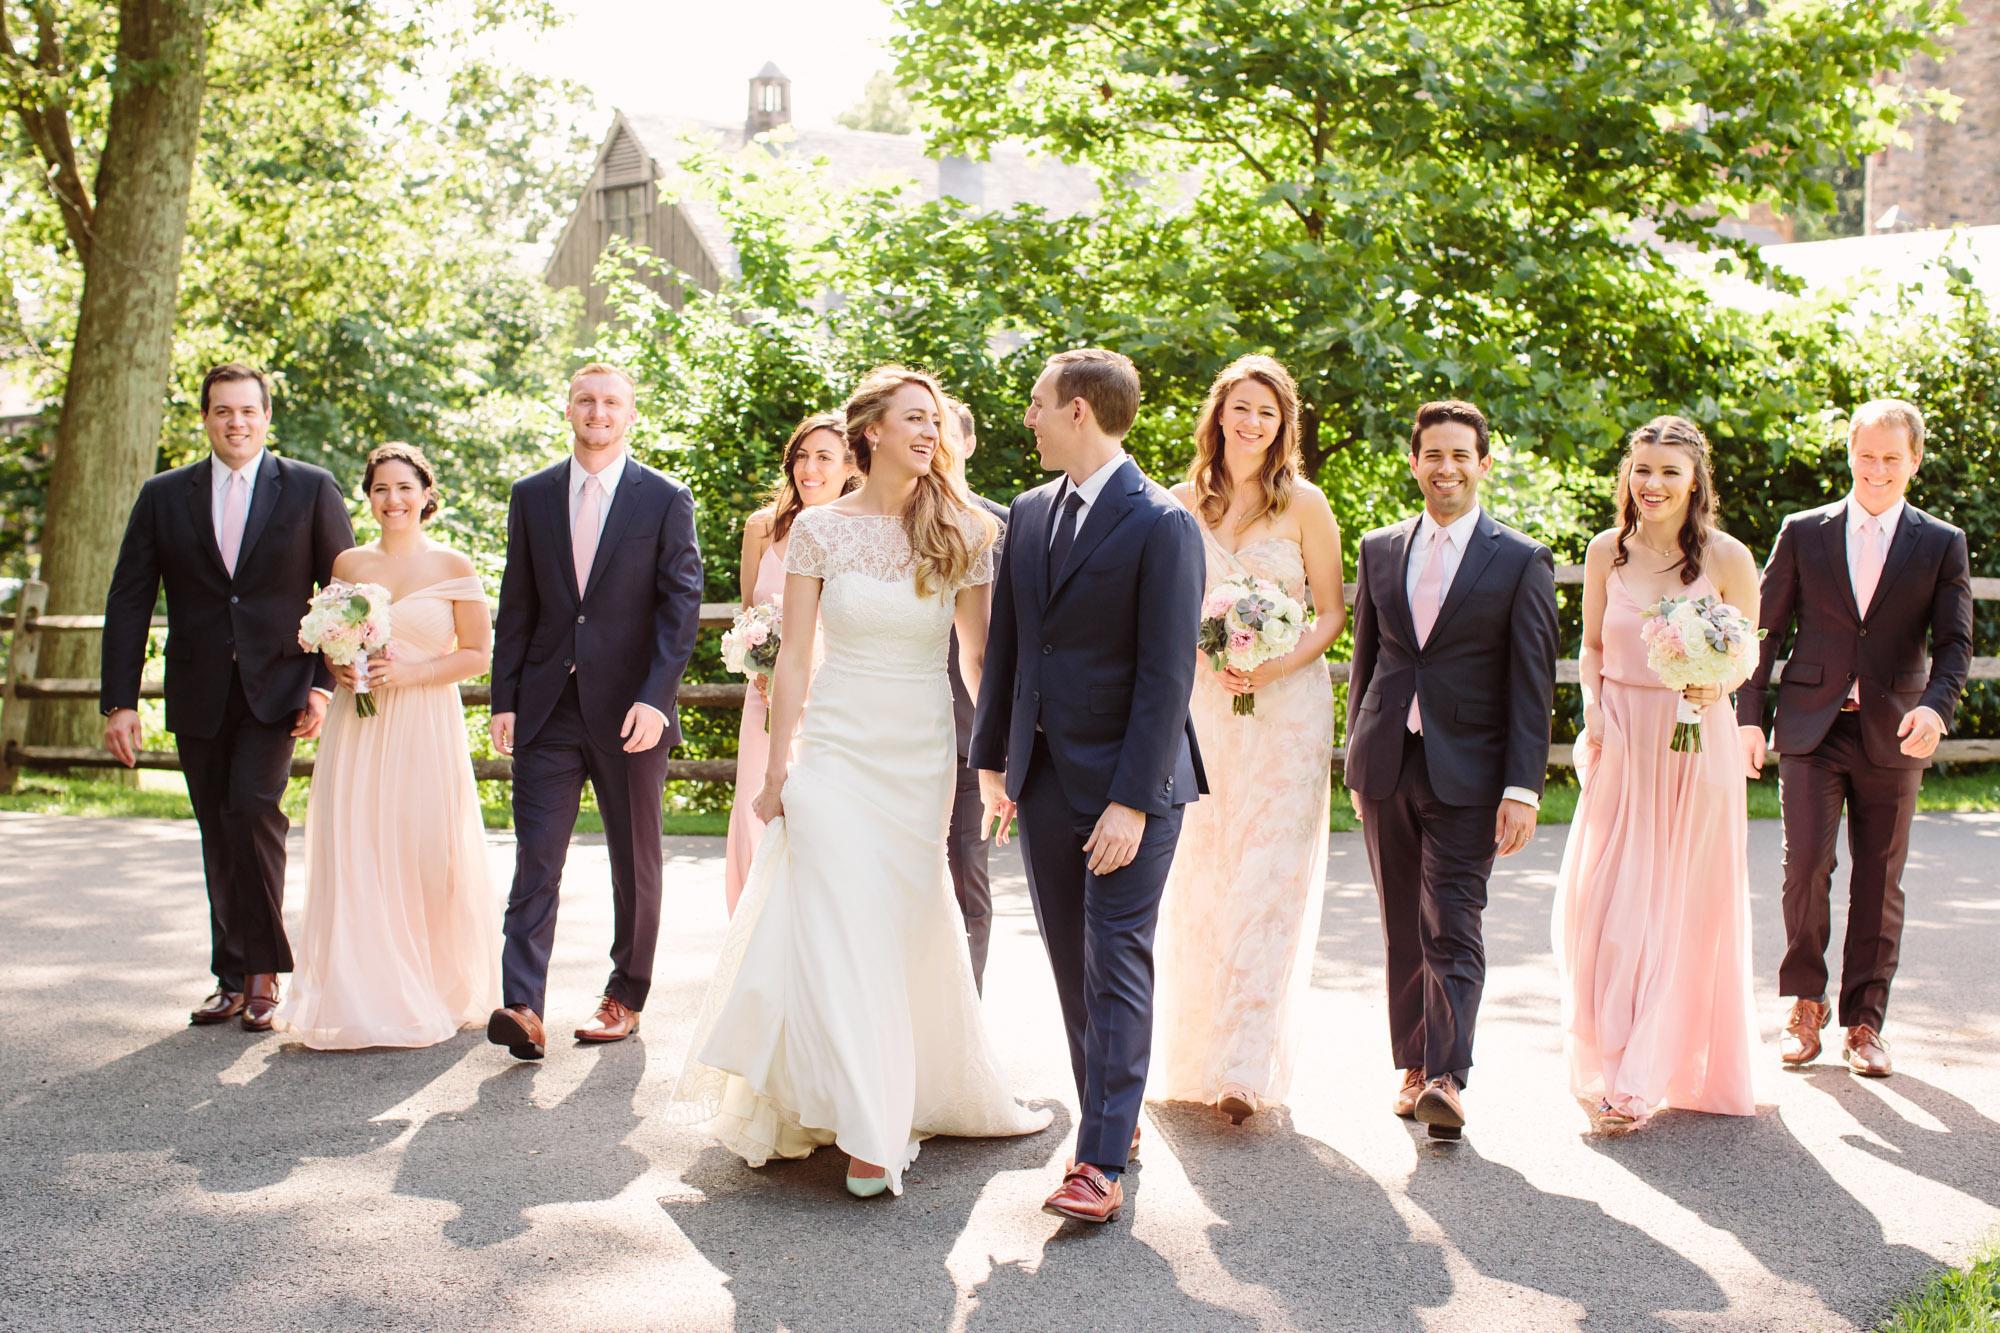 28_Jessica_Ted_Blue_Hill_Stone_Barns_Wedding_Pocantico_NY_Tanya_Salazar_Photography_068.jpg